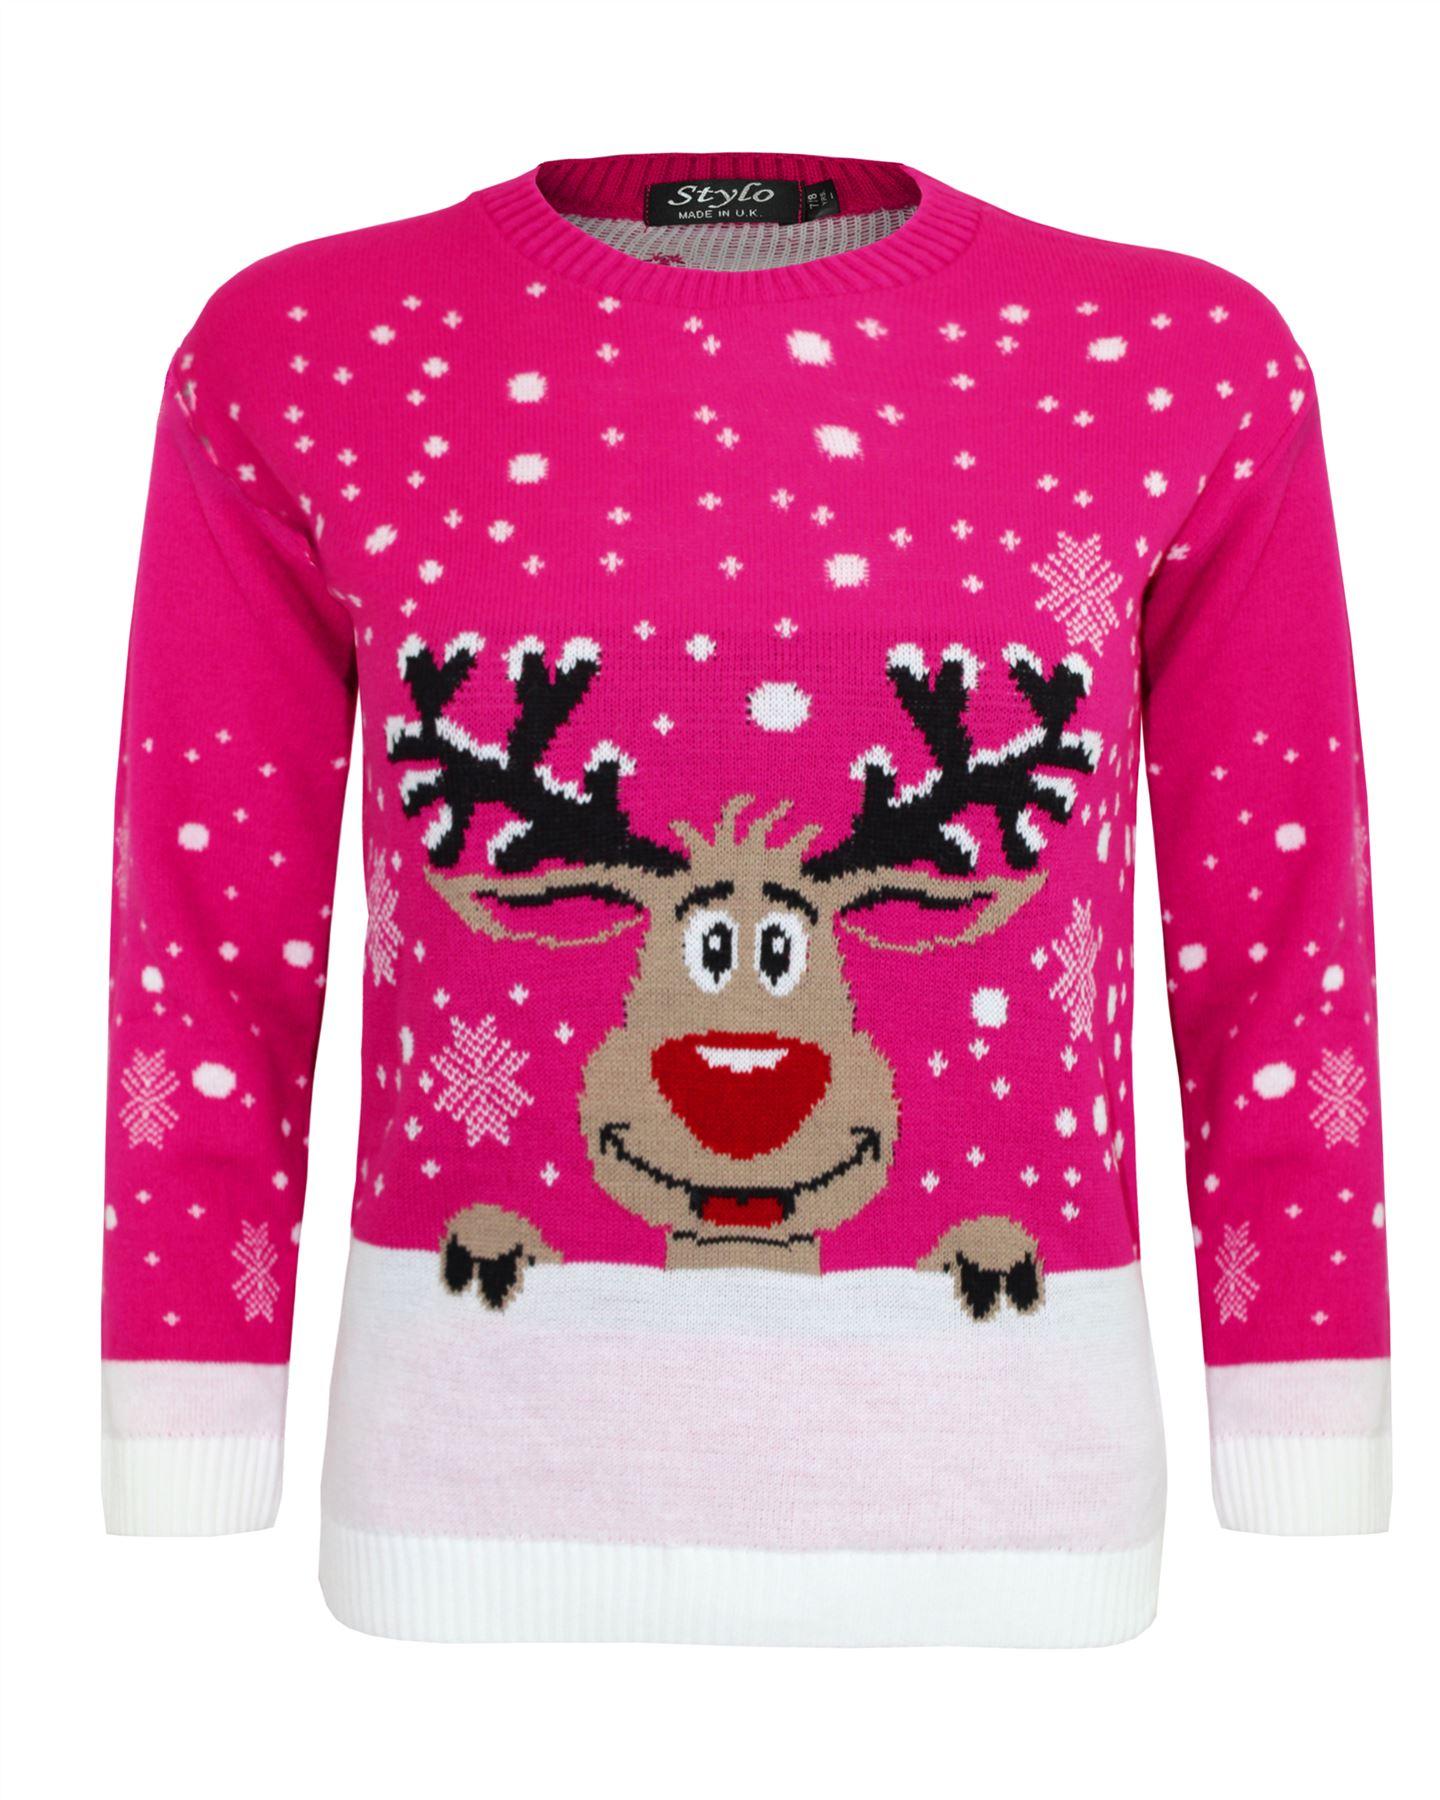 Winter Coat Kid Boy Girl Novelty Christmas Sweater Xmas Deer Pullover Jumper Top